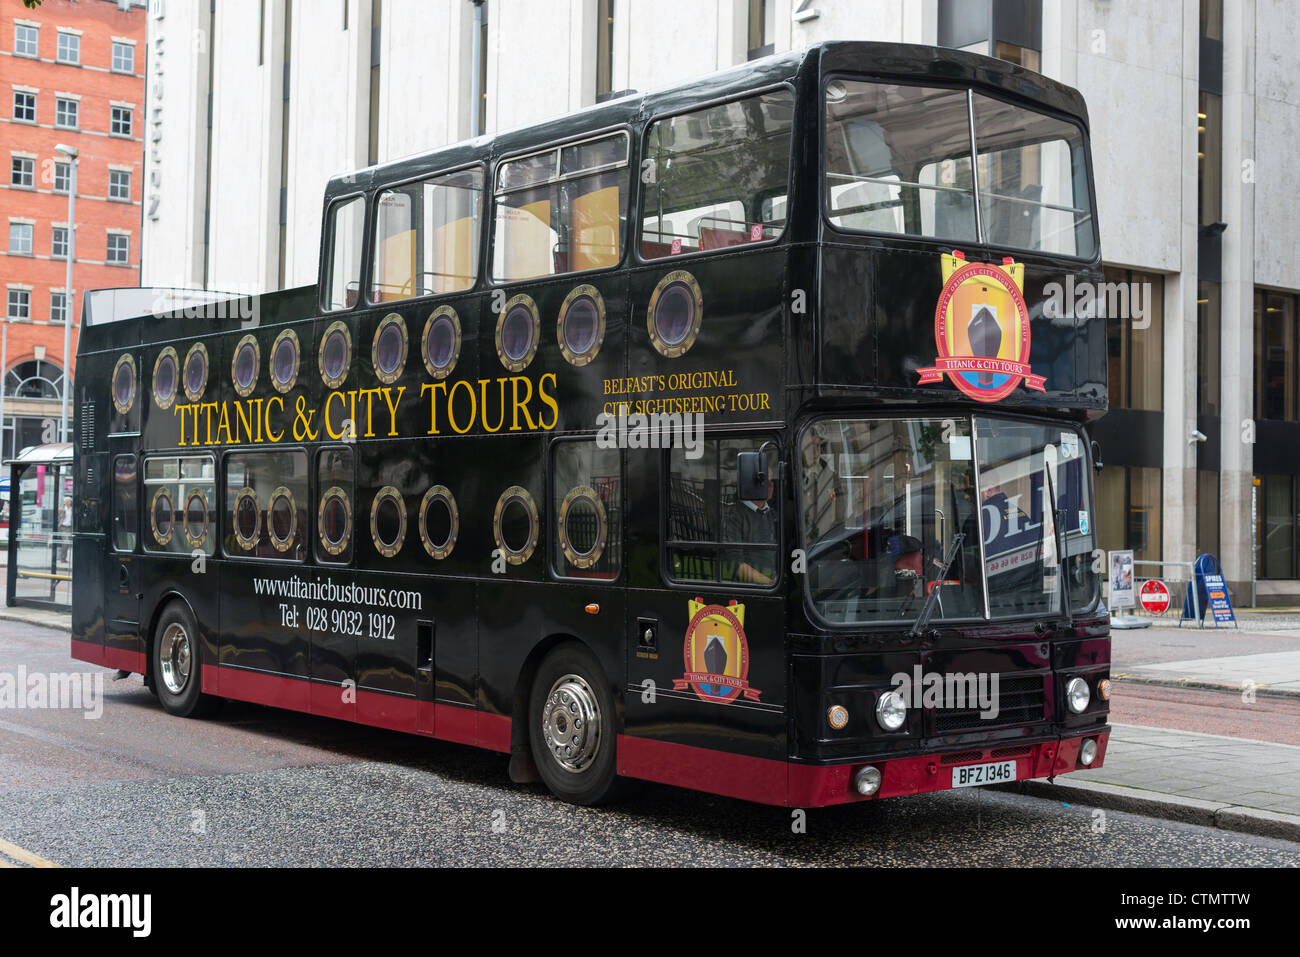 Titanic & City Tours bus in Belfast, Northern Ireland. - Stock Image